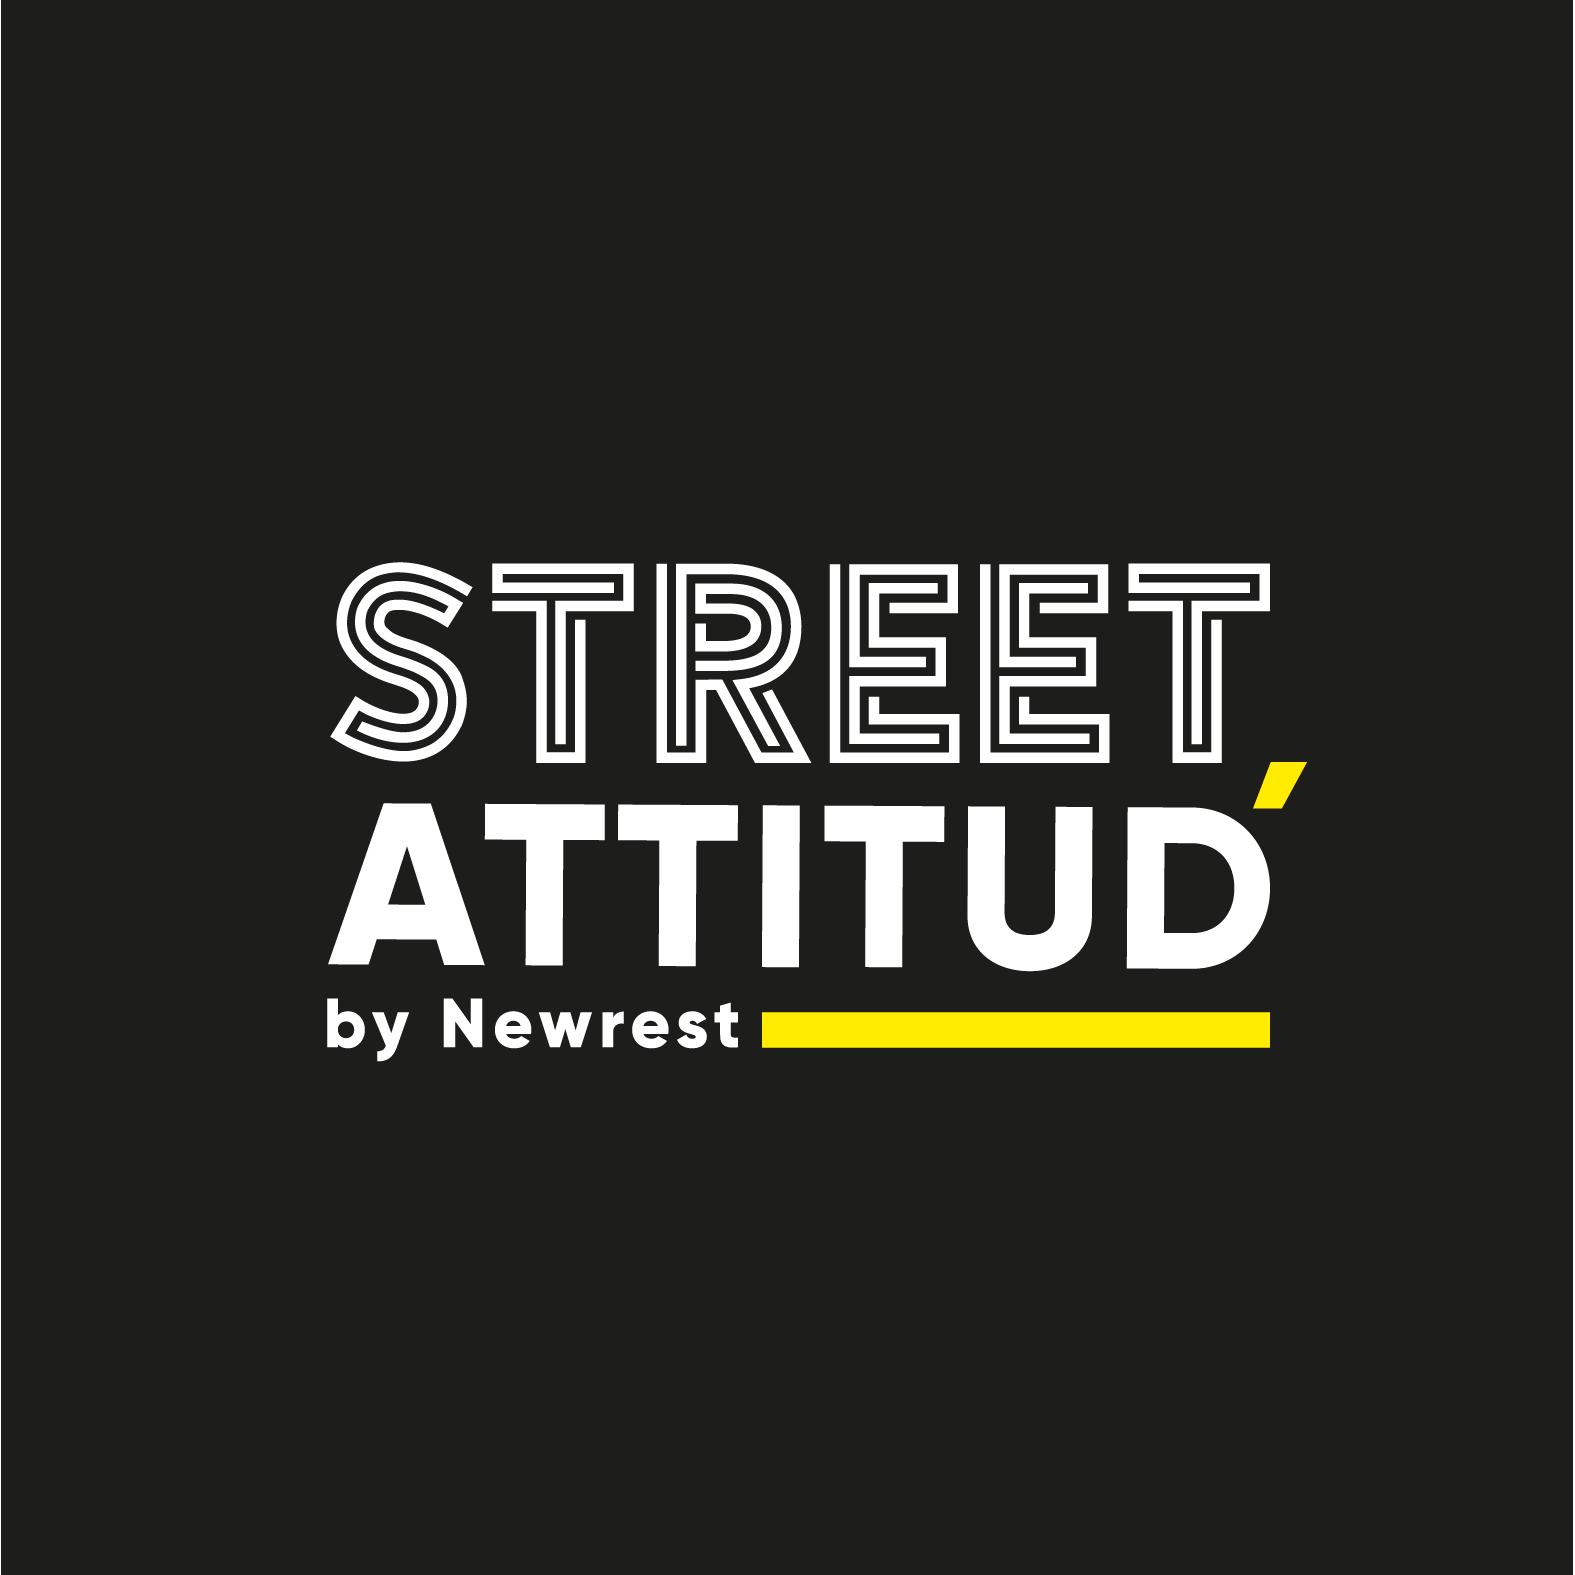 Menu Street Attitude